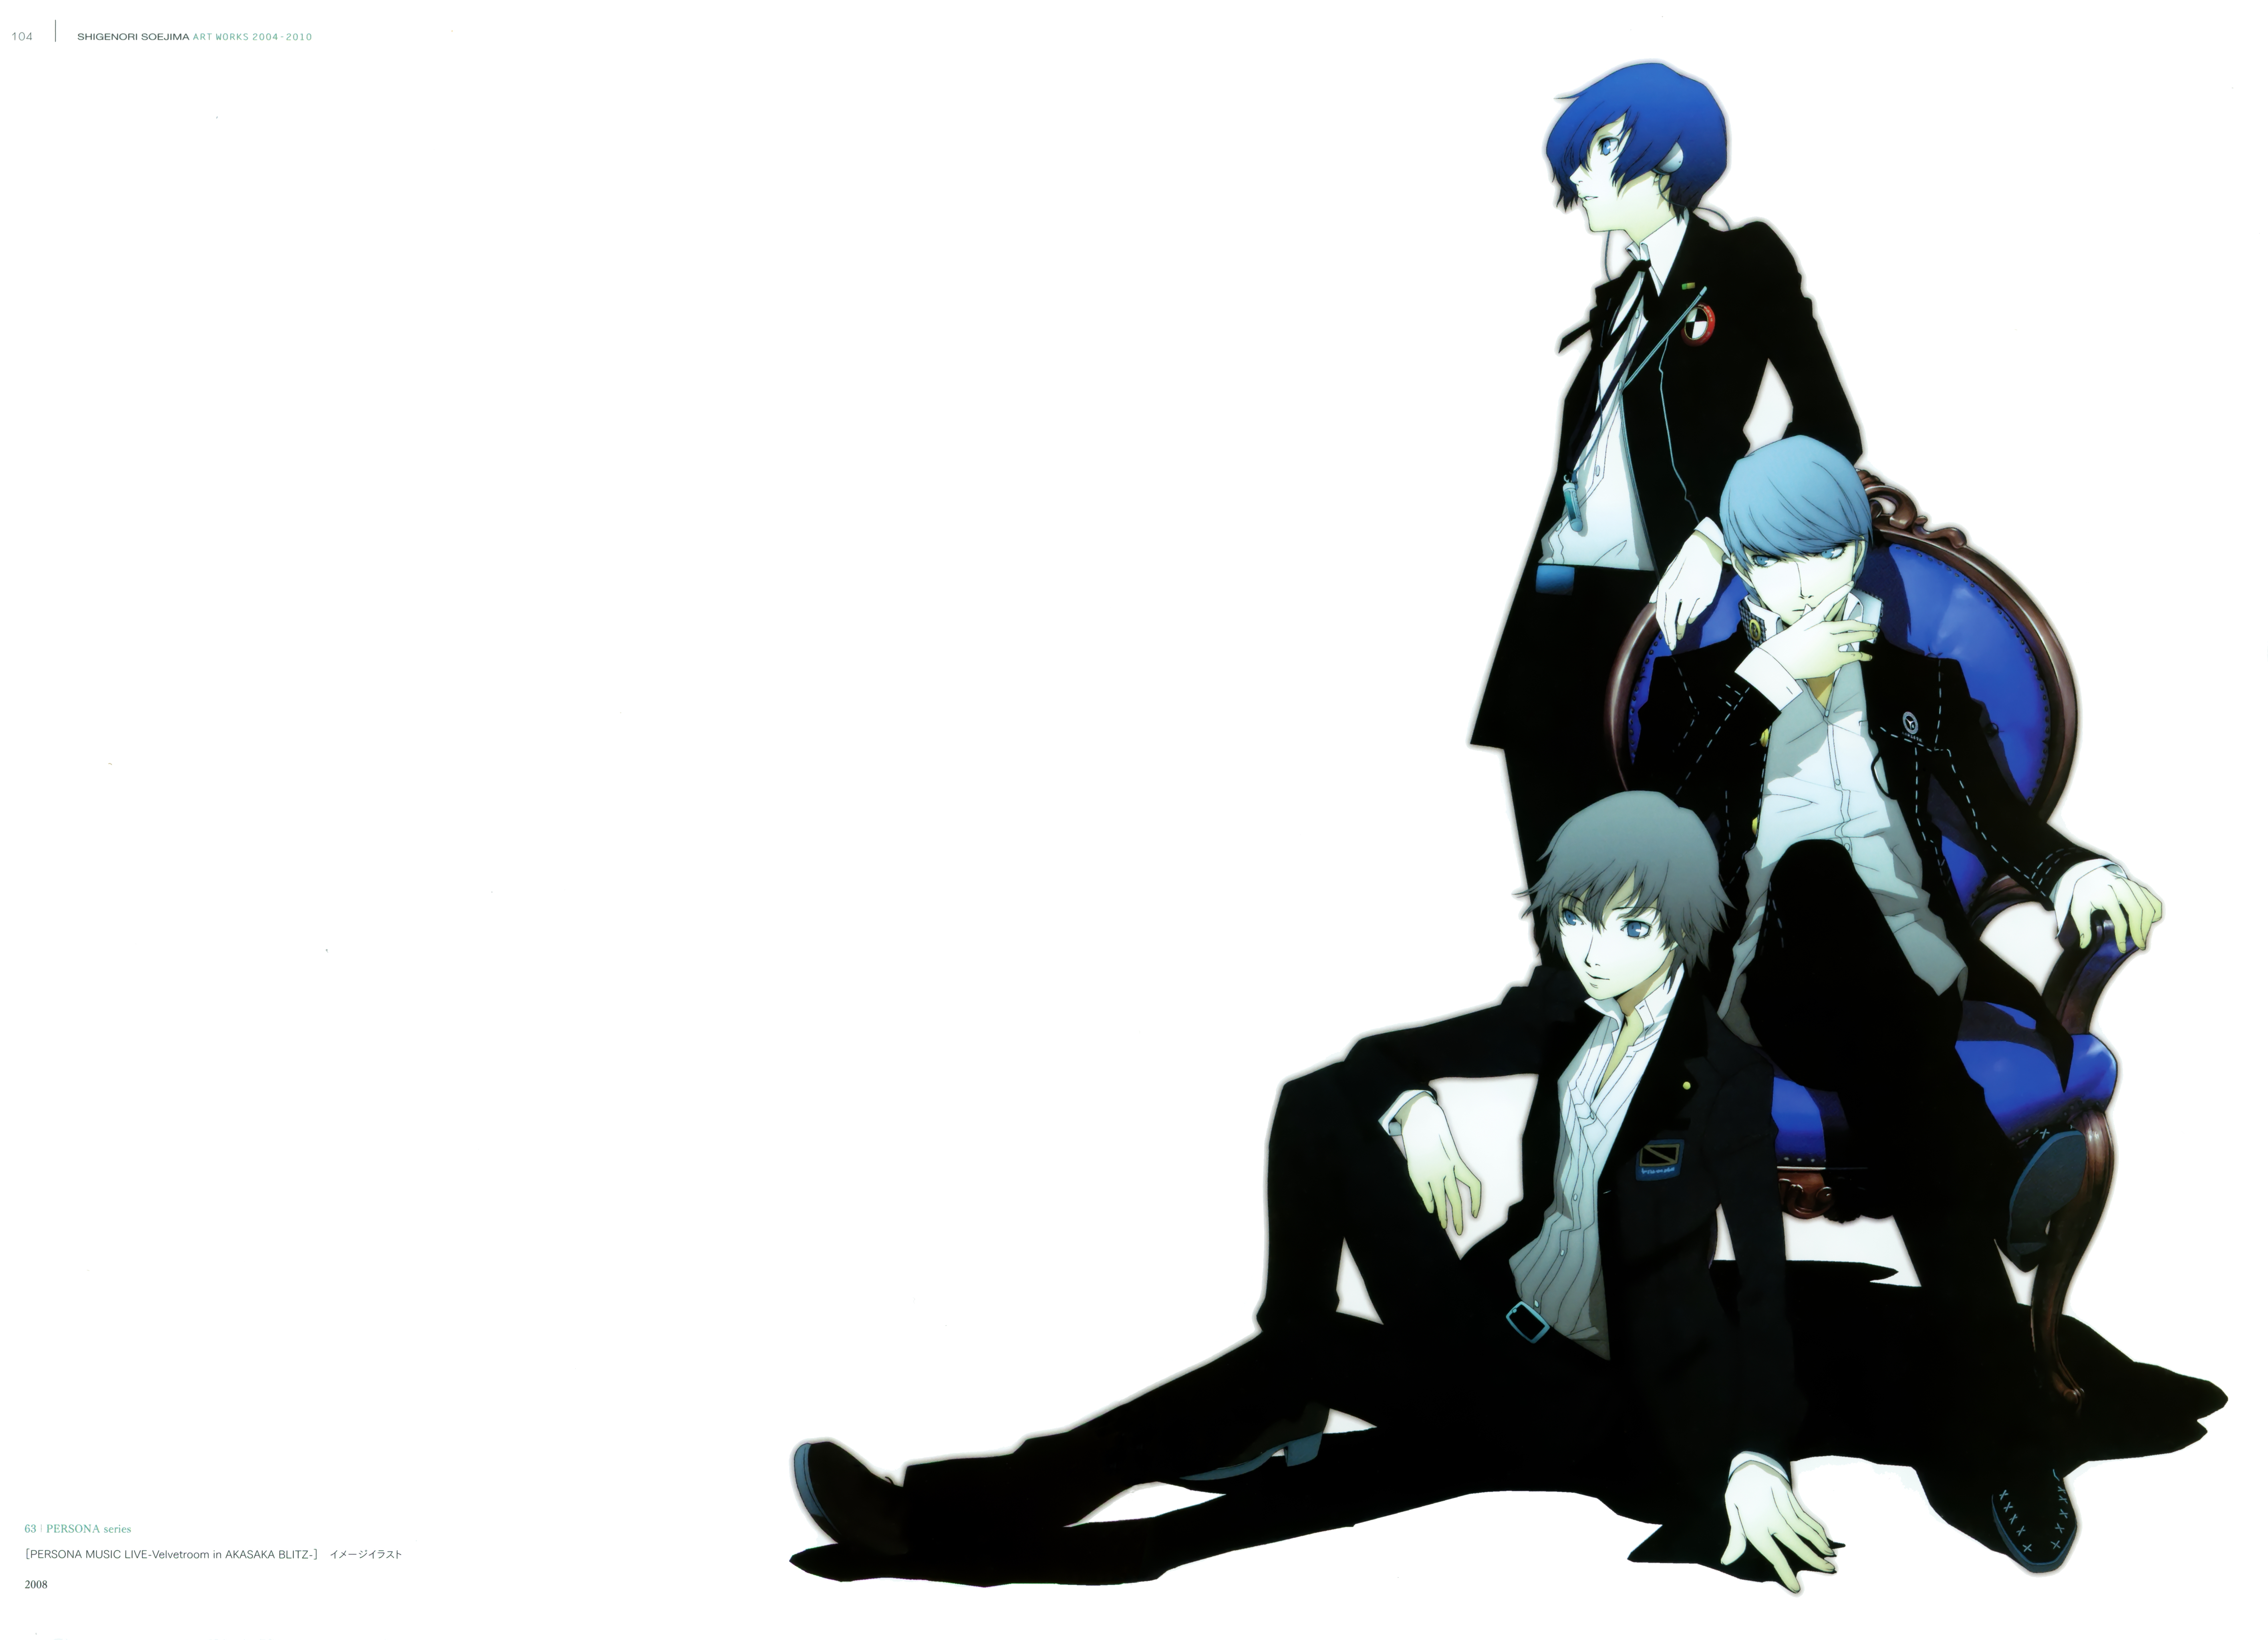 Shin Megami Tensei Persona 4 Screenshot Click To Enlarge